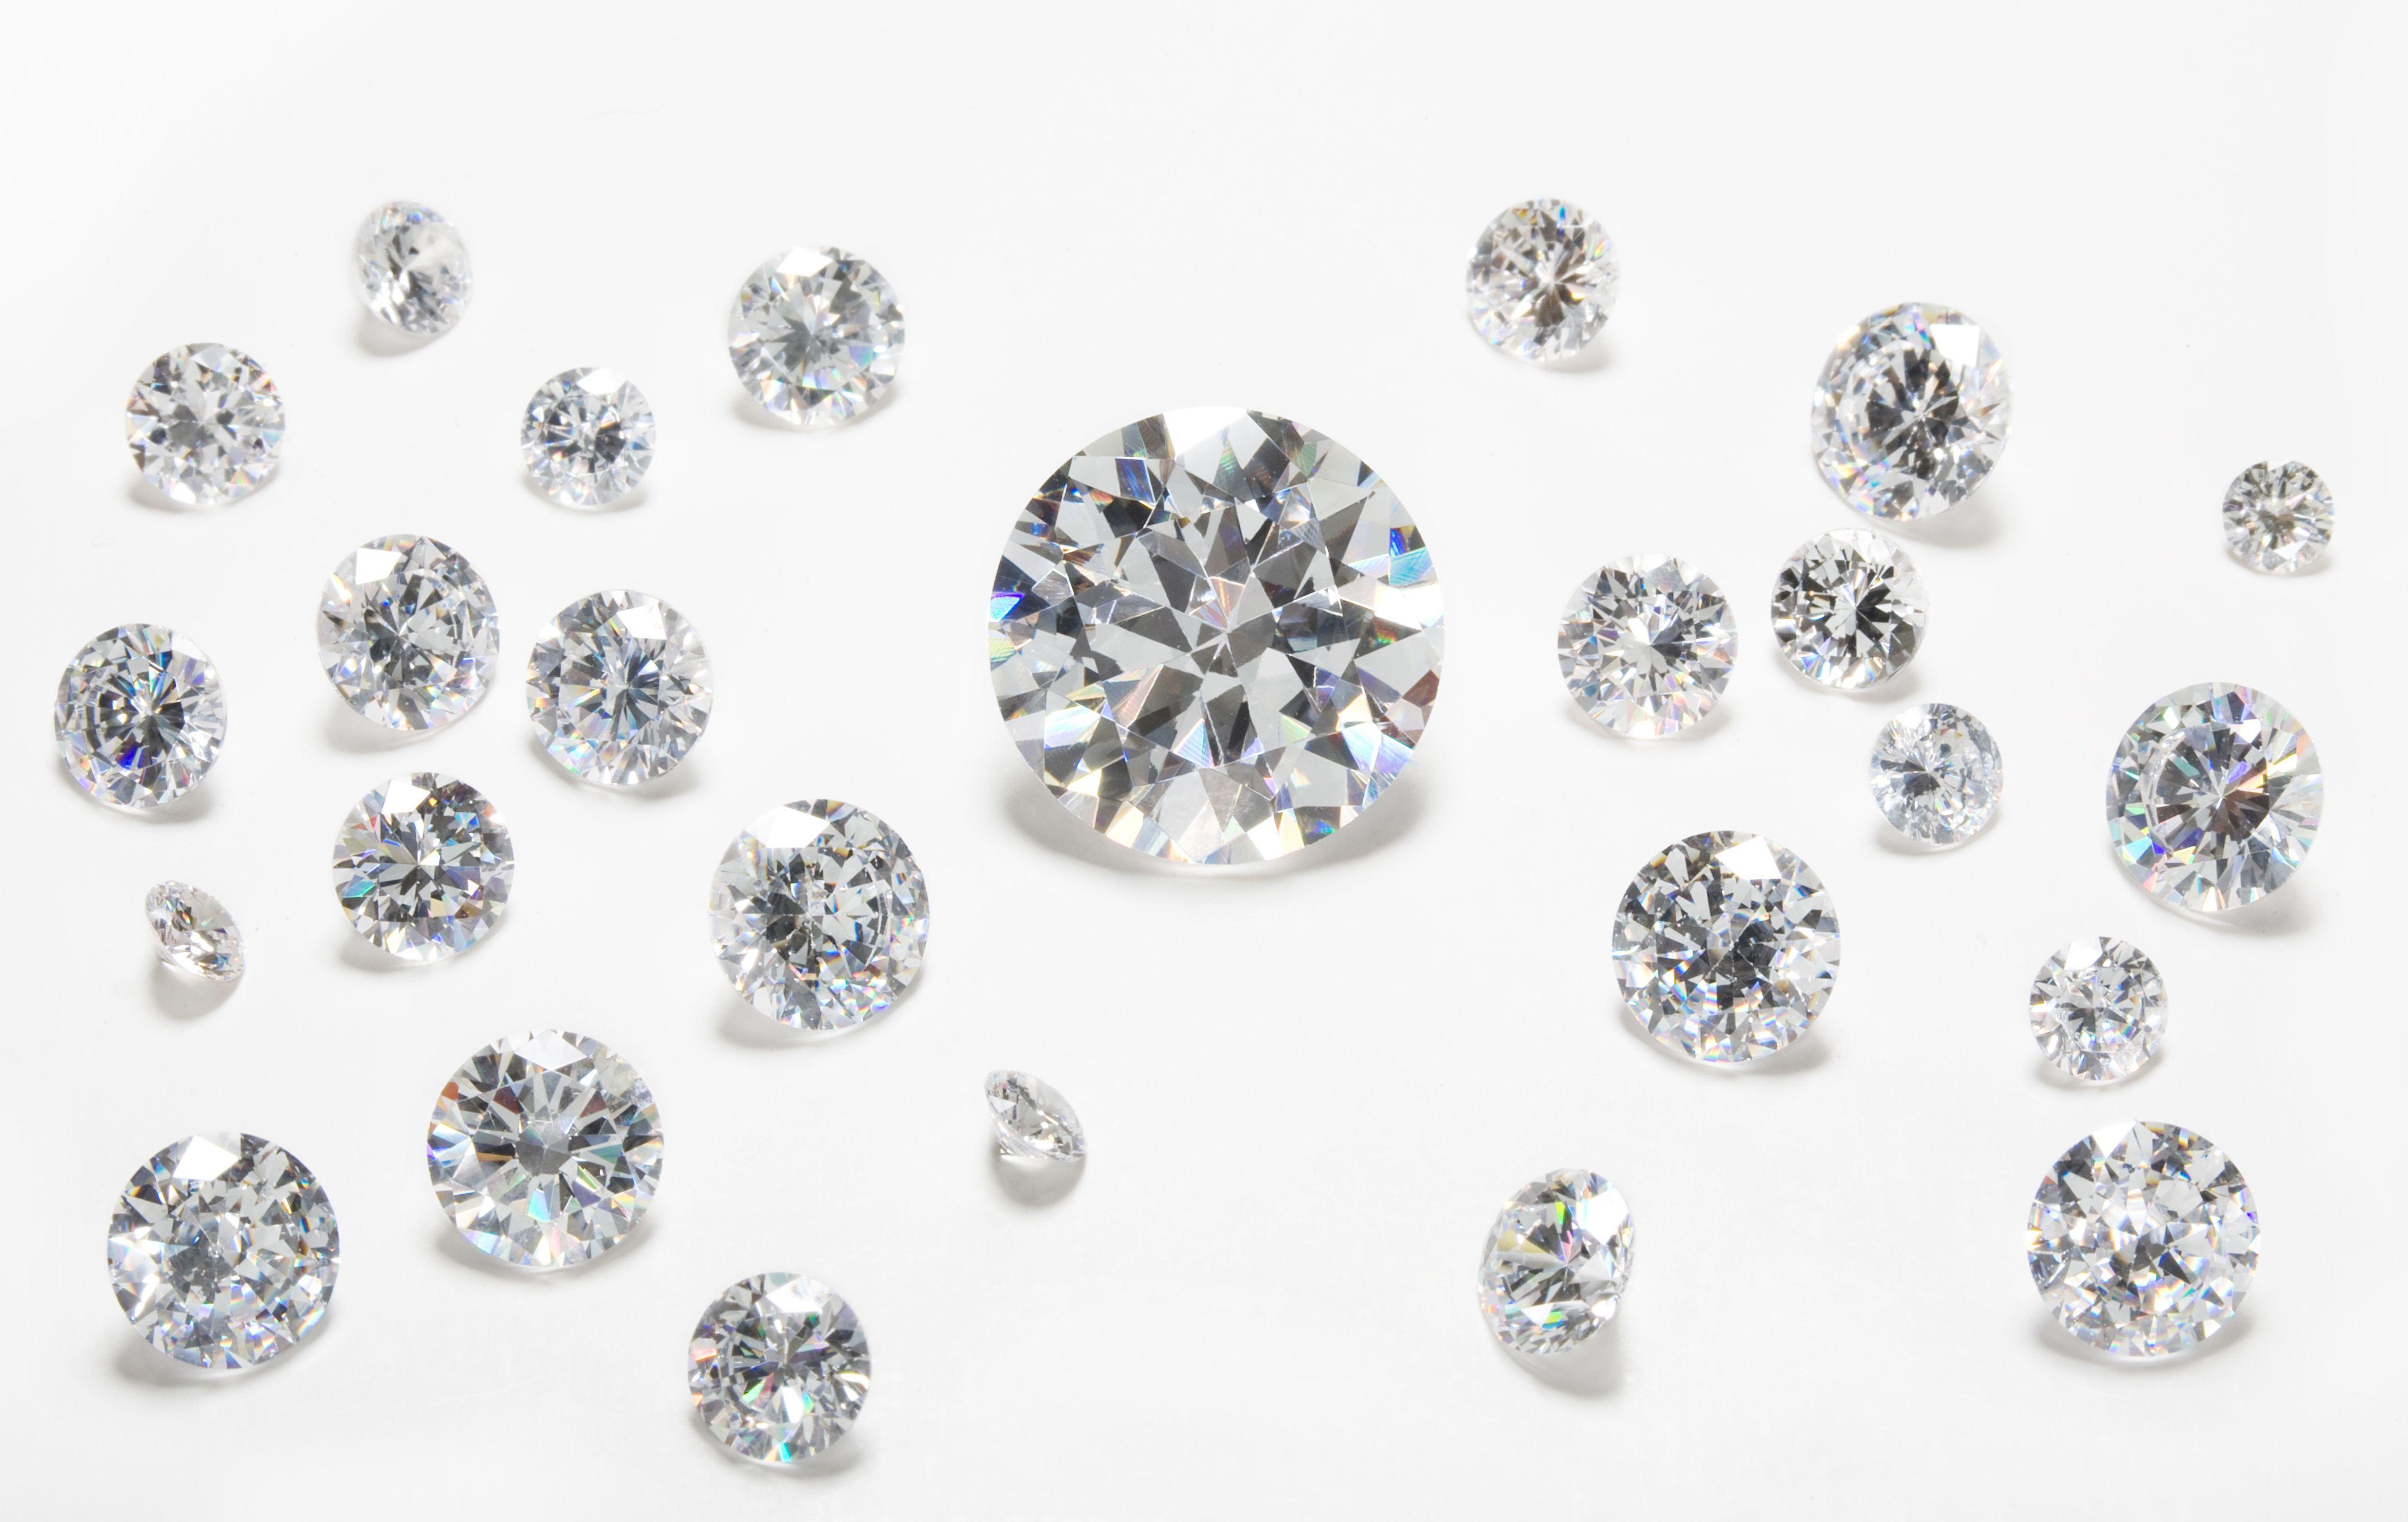 Using Crystals and Gemstones in Magic